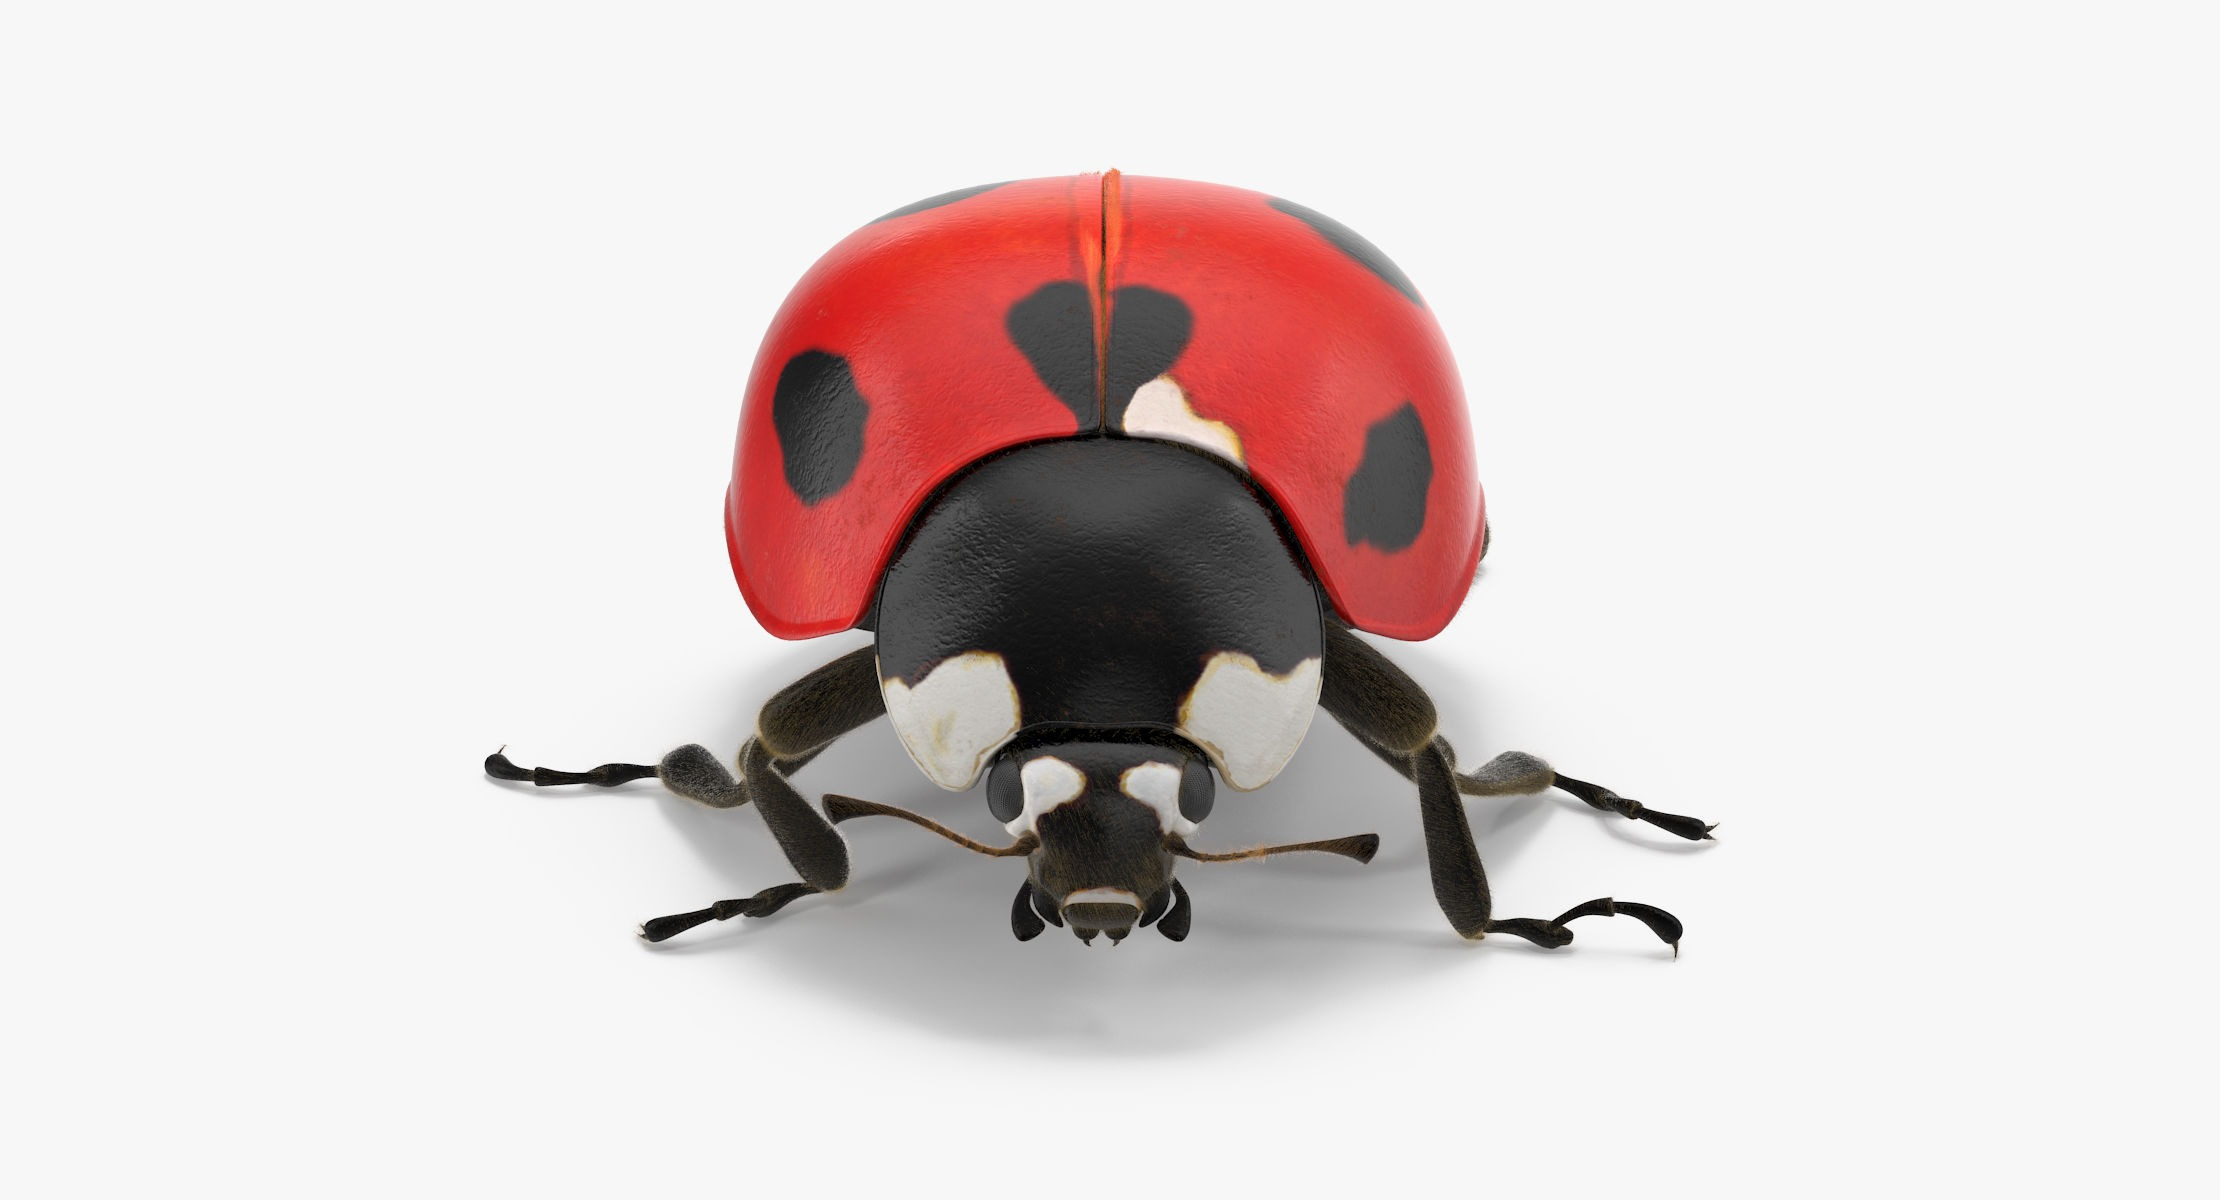 Ladybug 02 - reel 1